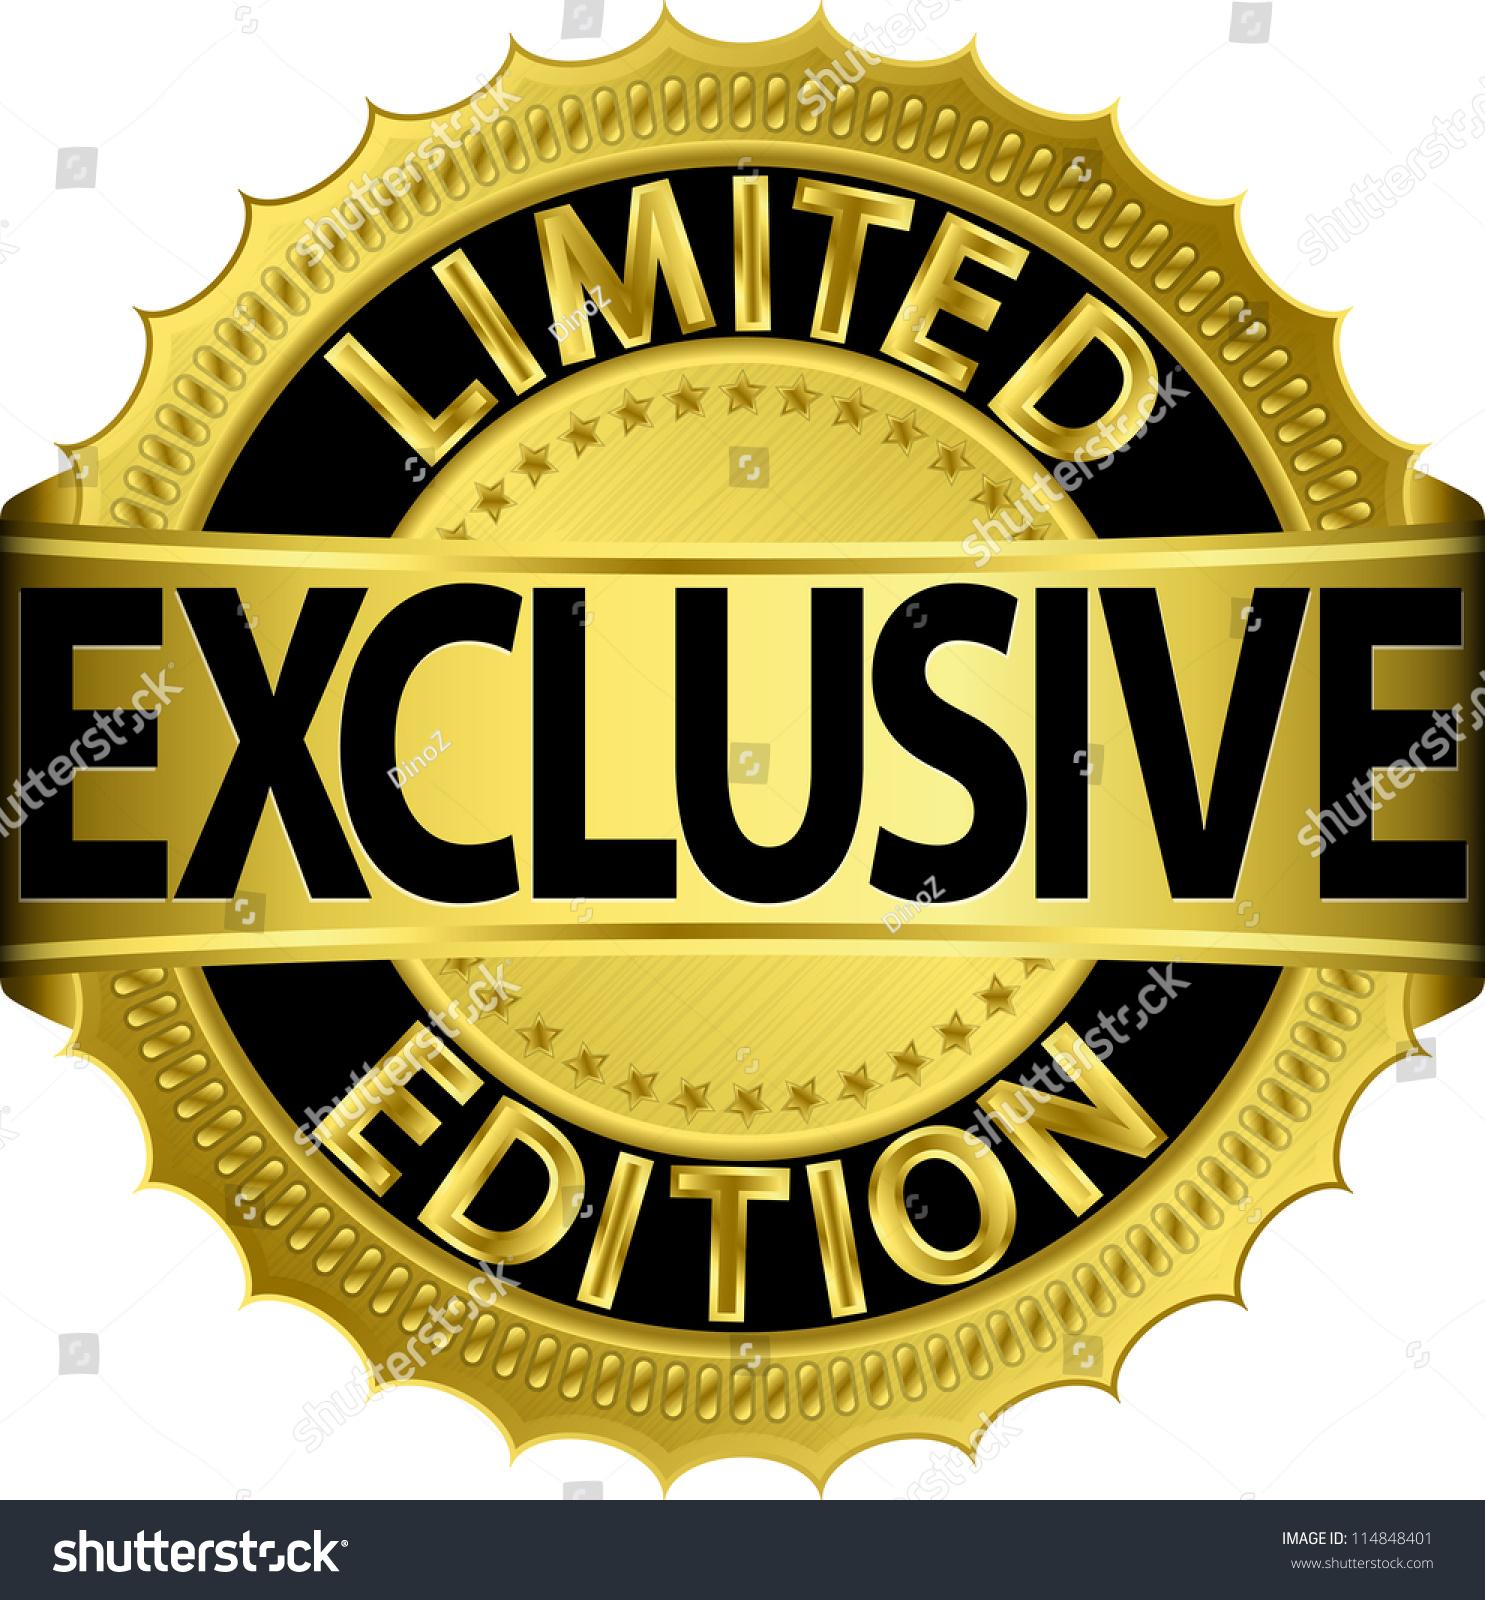 limited edition exclusive golden labelvector illustration stock vector 114848401 shutterstock. Black Bedroom Furniture Sets. Home Design Ideas